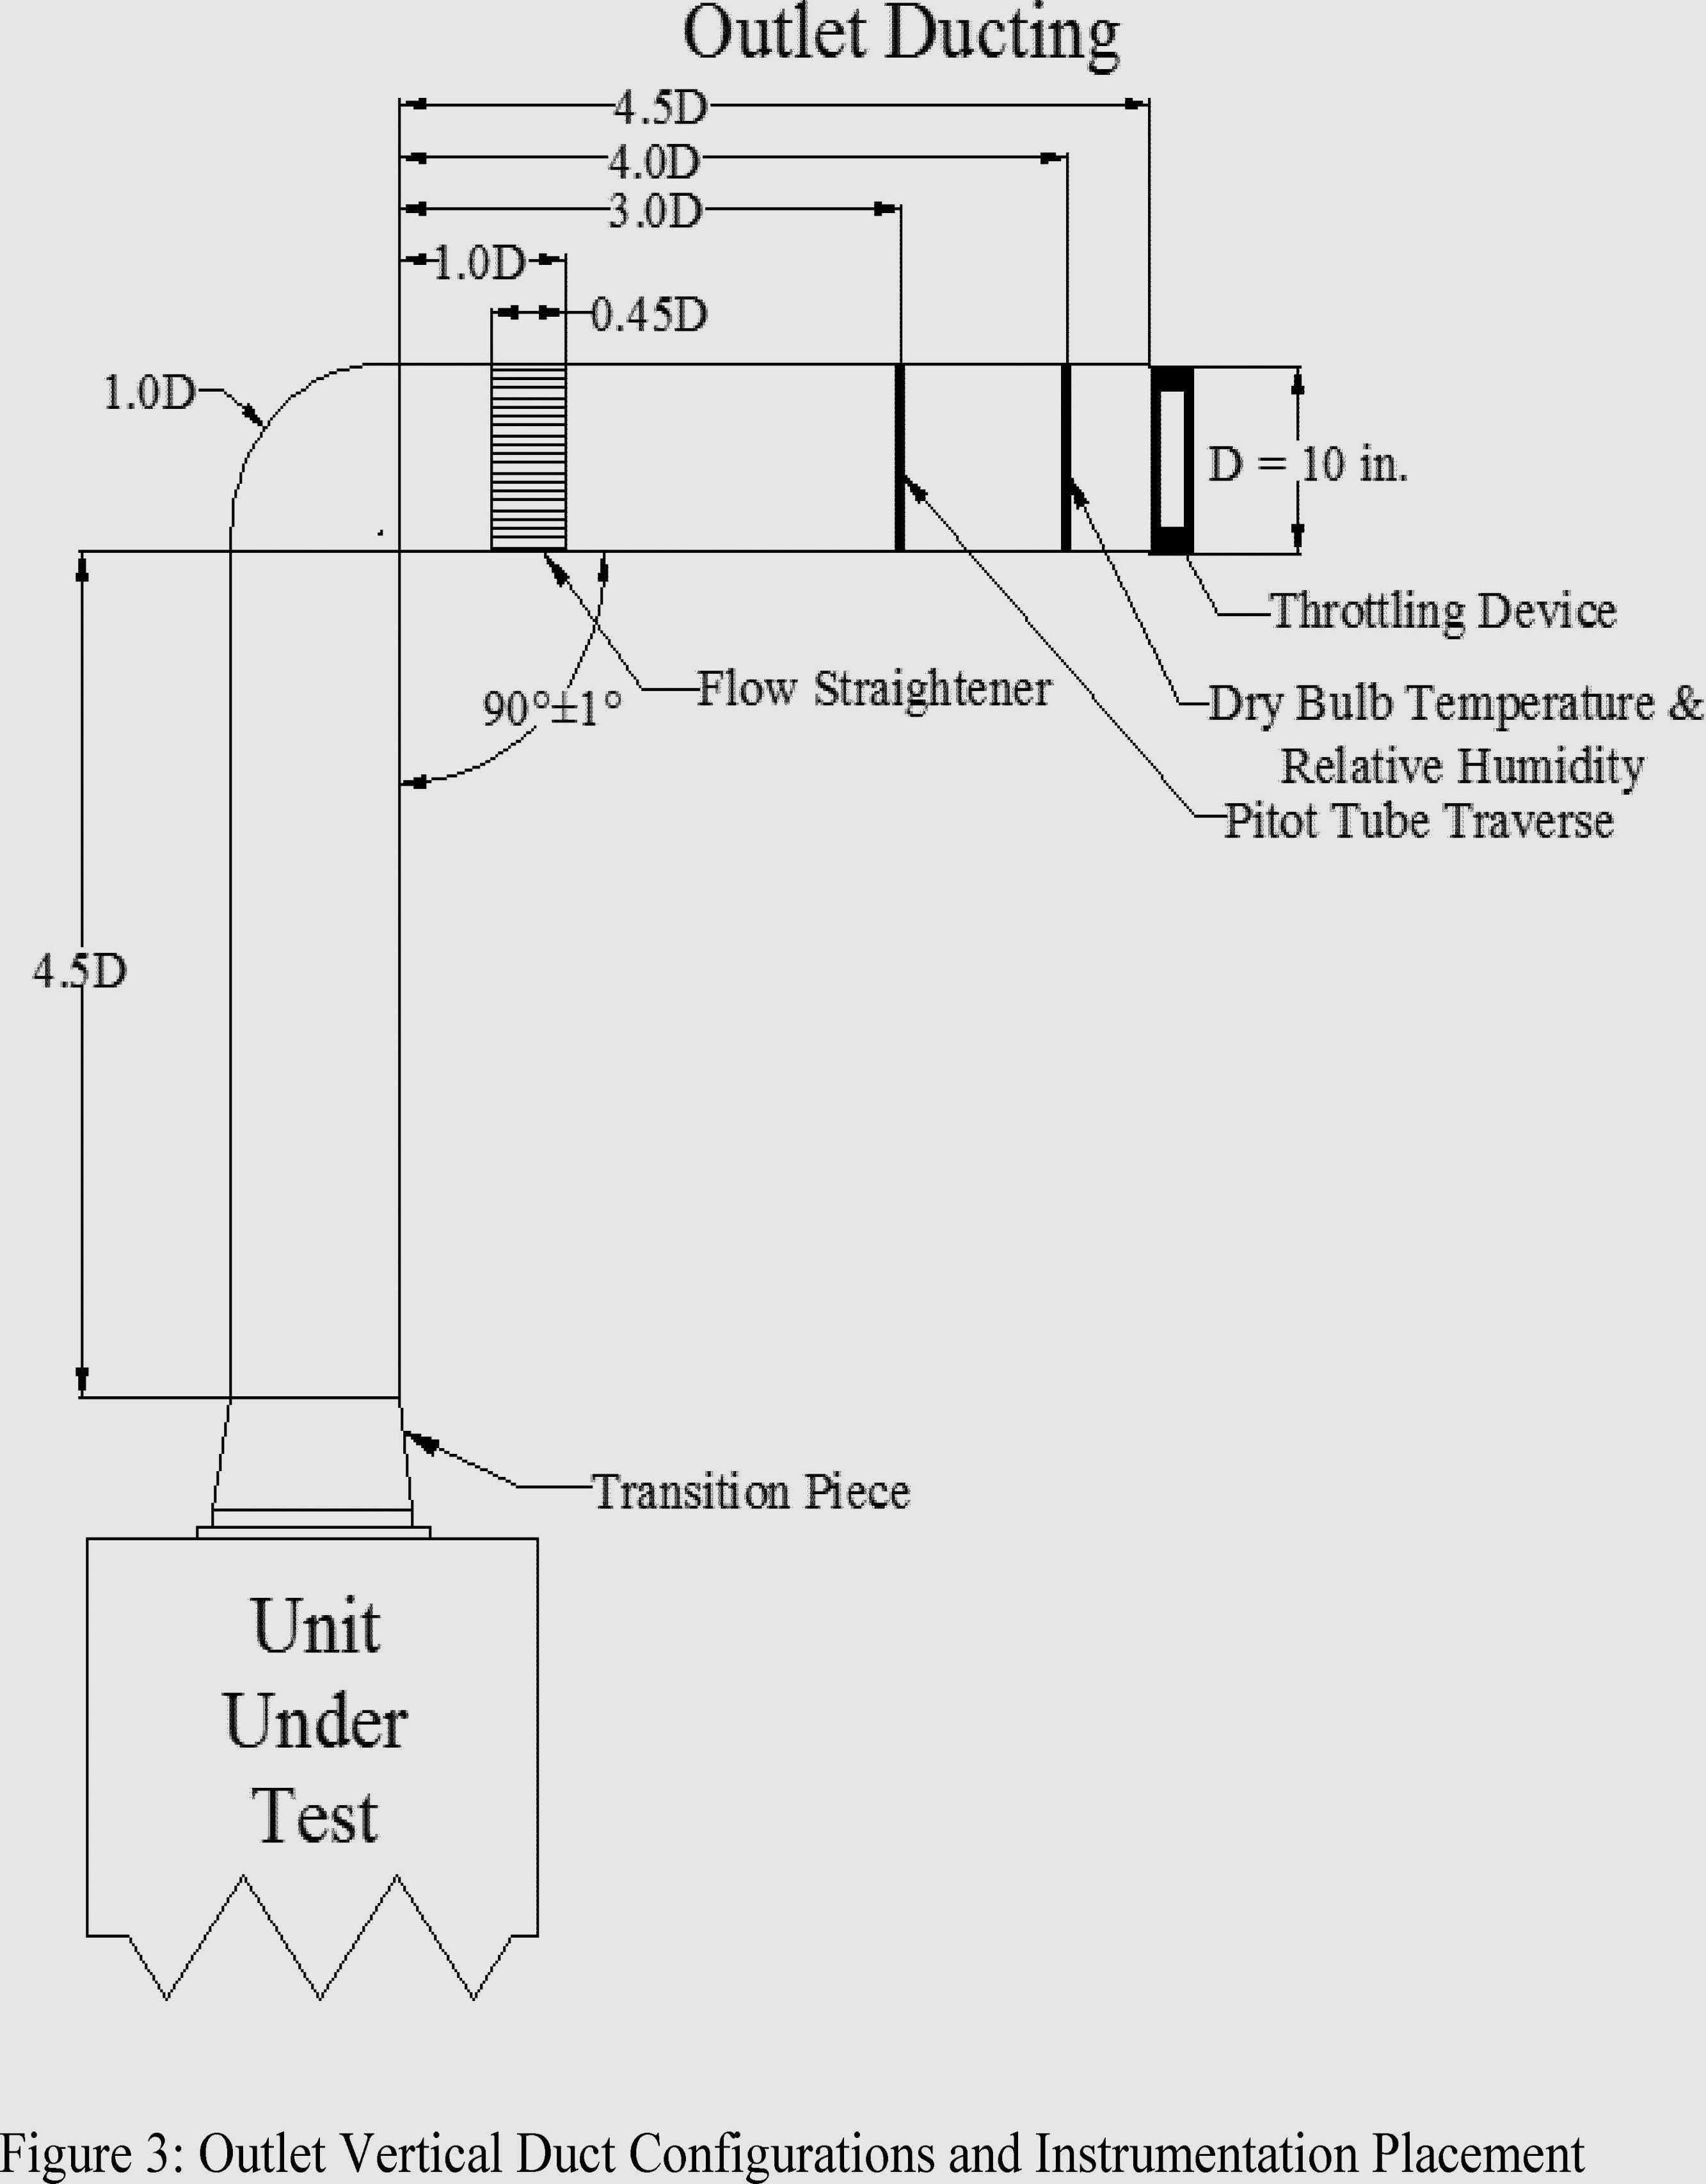 Pleasant Wiring Diagram 3 Way Switch Inspirational 3 Way Switch Wiring Wiring 101 Carnhateforg